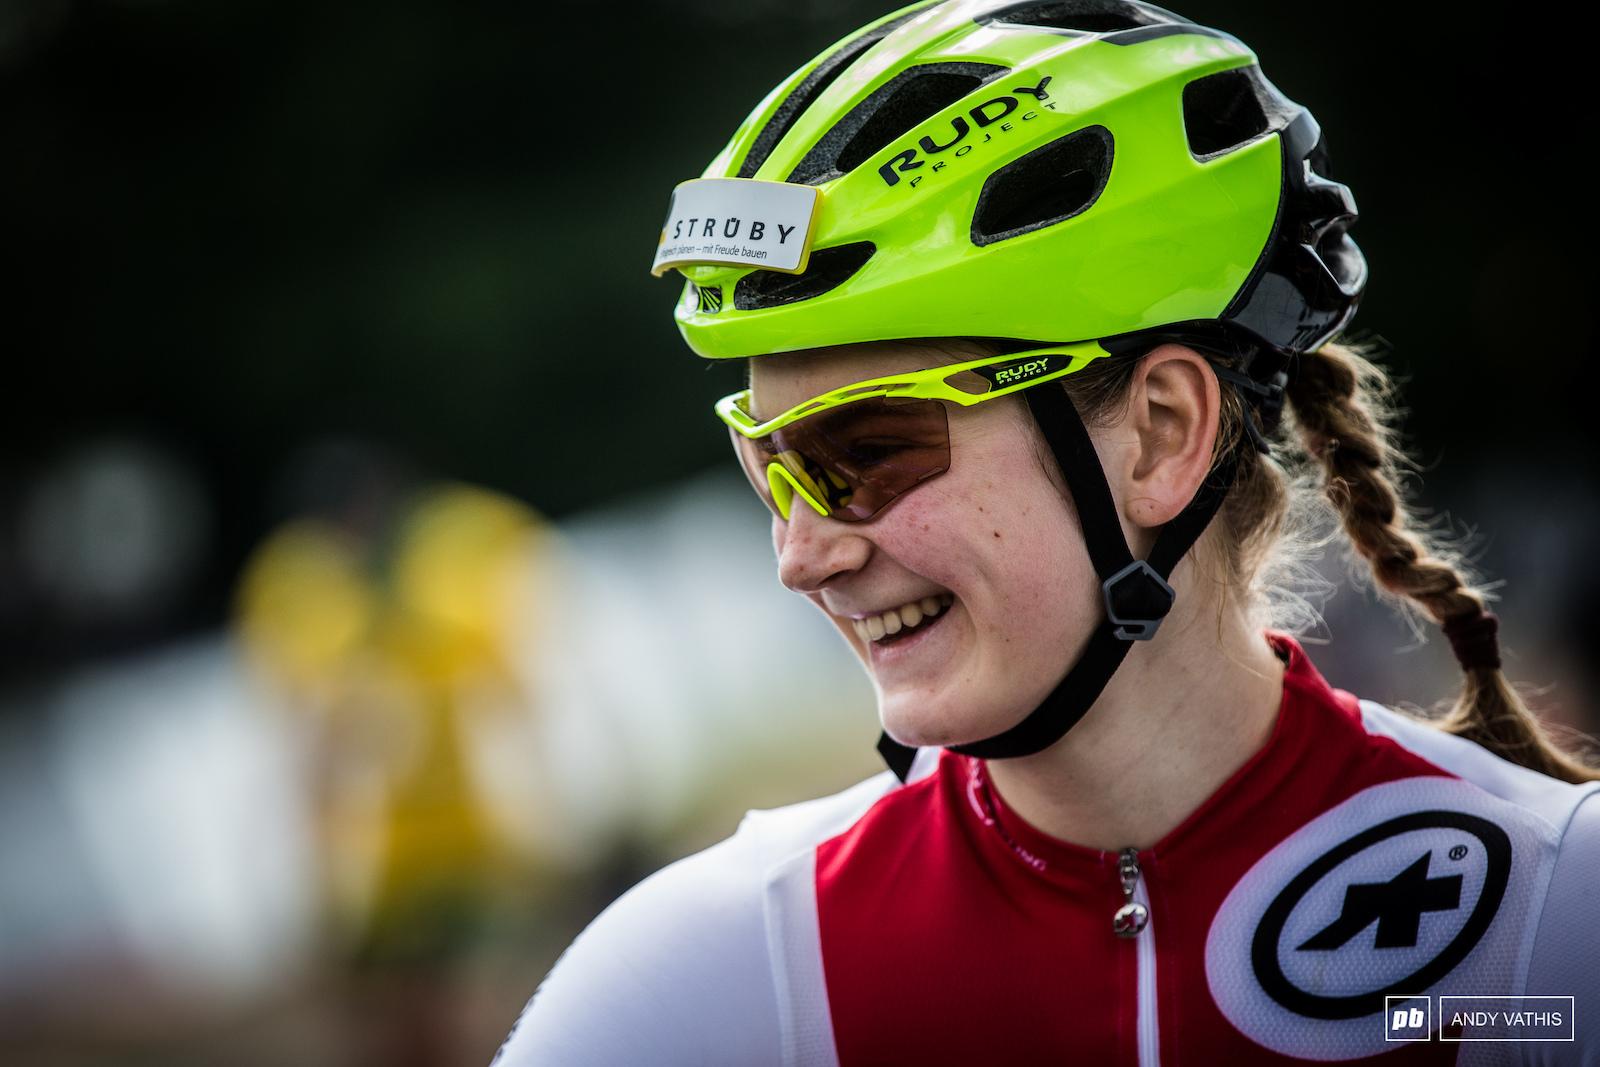 Jacqueline Schneebeli ready to take on the tough Quebec course.